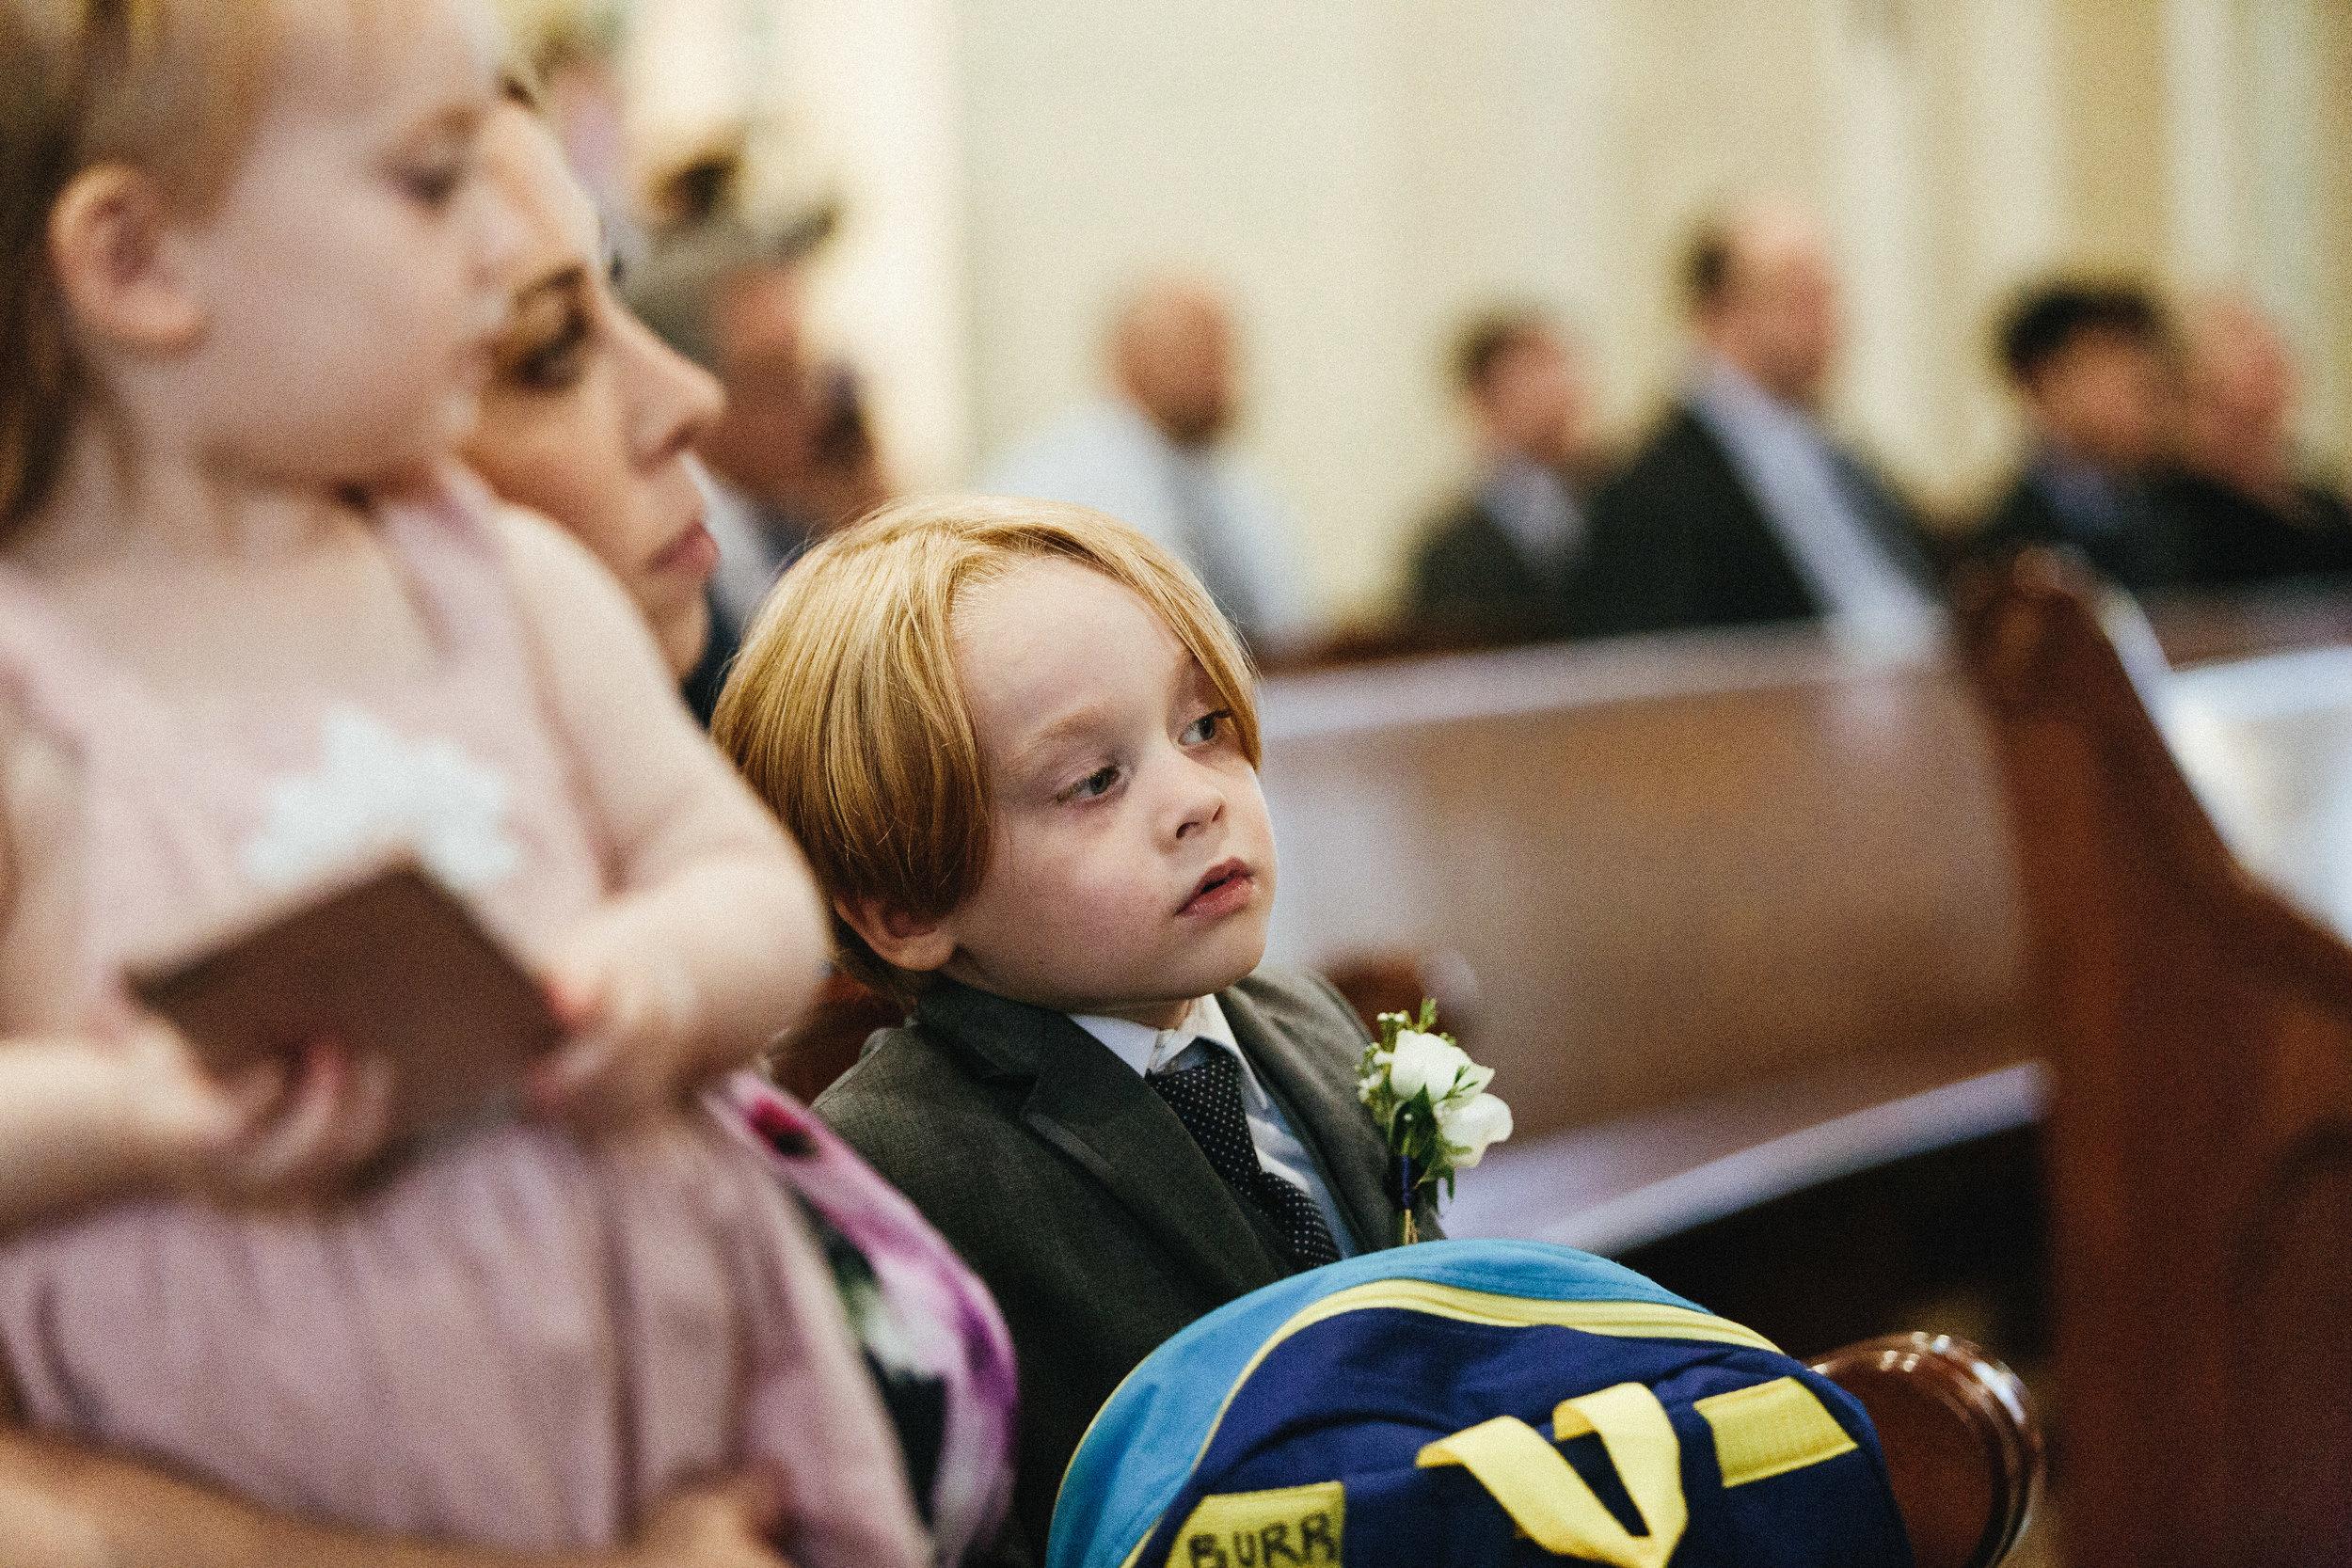 roswell_st_peter_chanel_catholic_avalon_hotel_alpharetta_wedding-1473.jpg